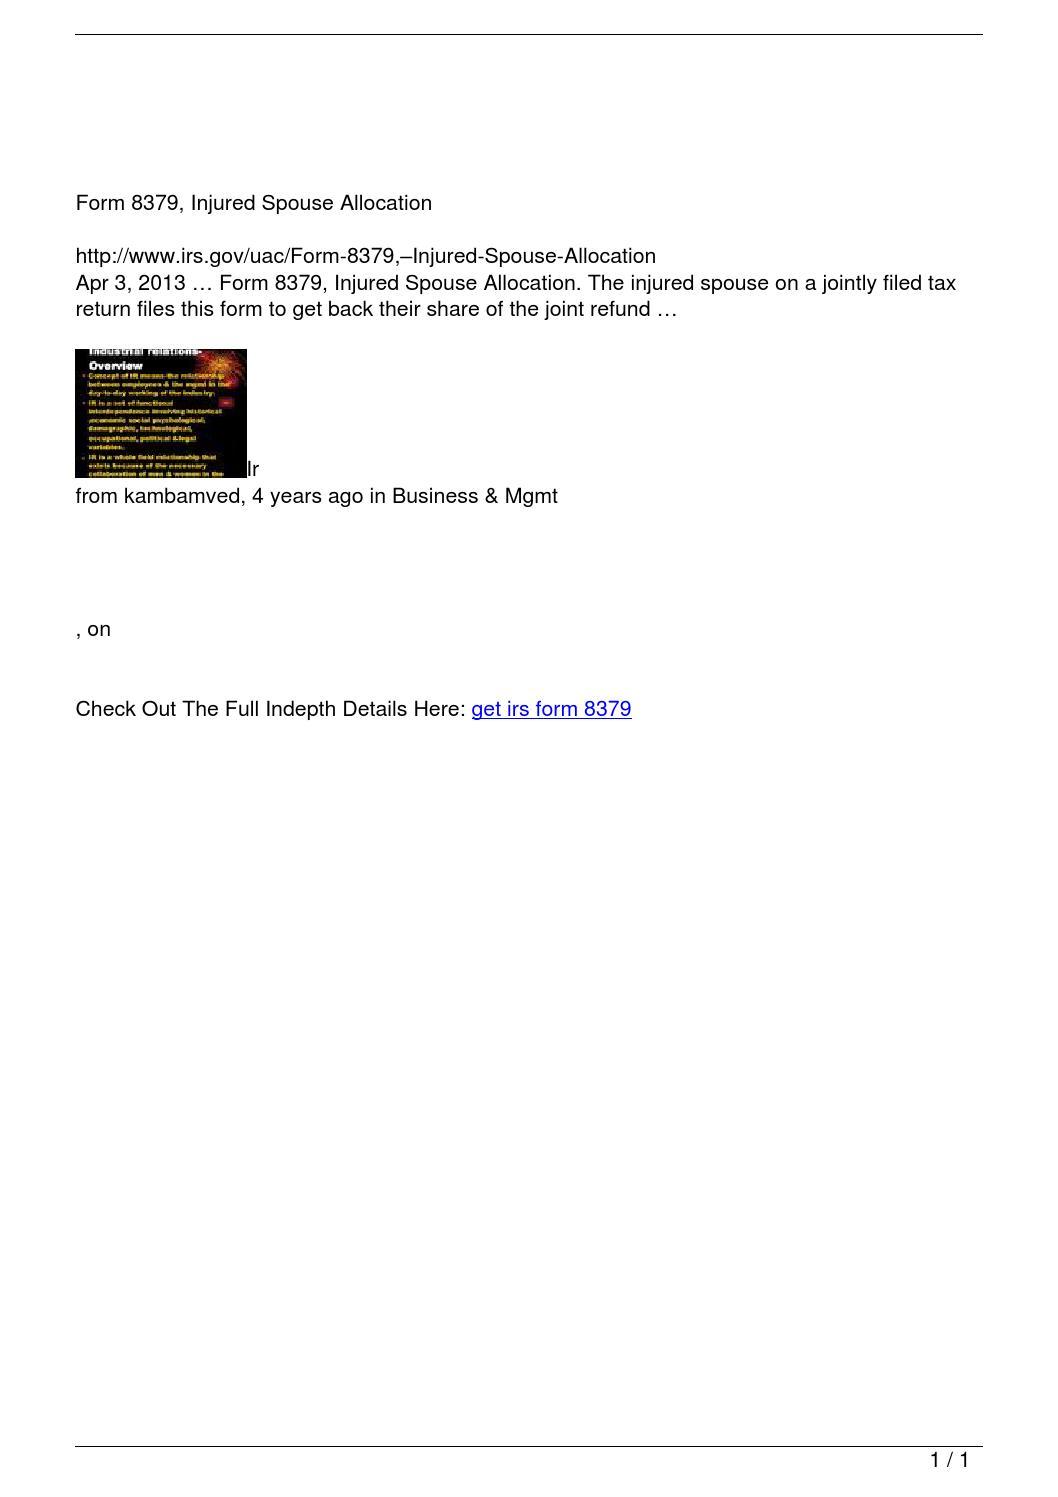 get irs form 8379 by Getirs - issuu